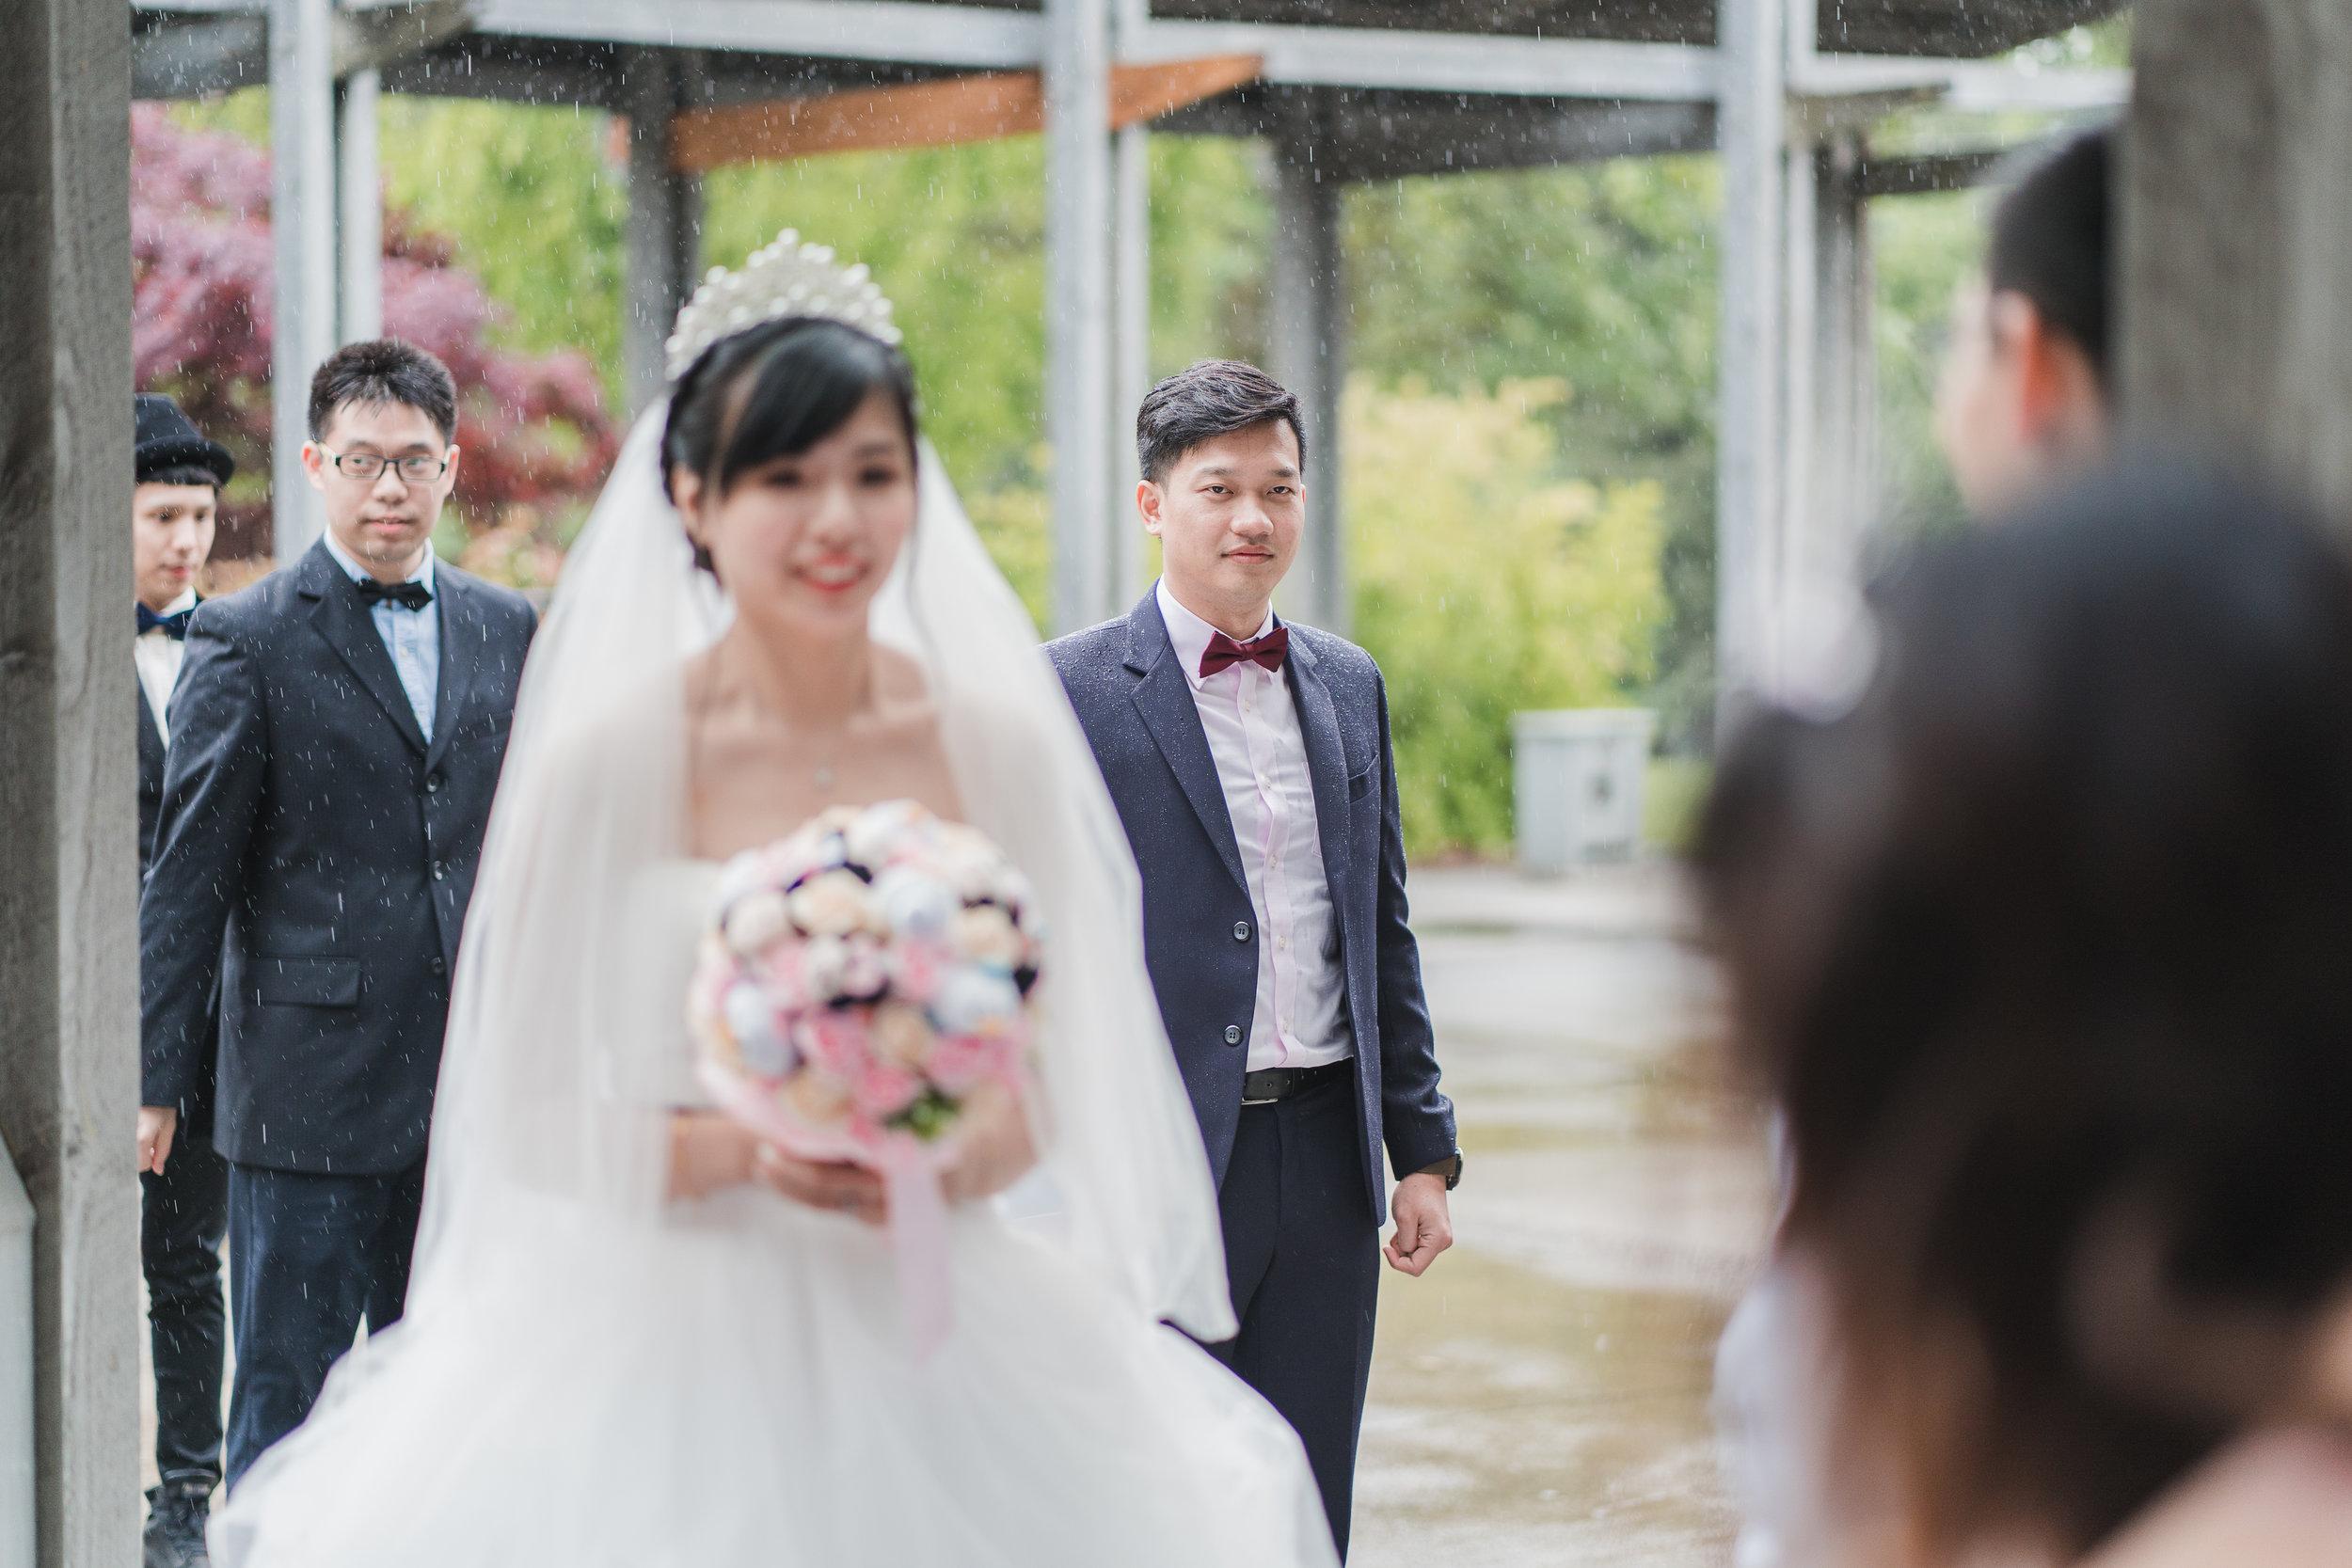 20190520 - Pamela & Matthew Wedding - 0209.jpg